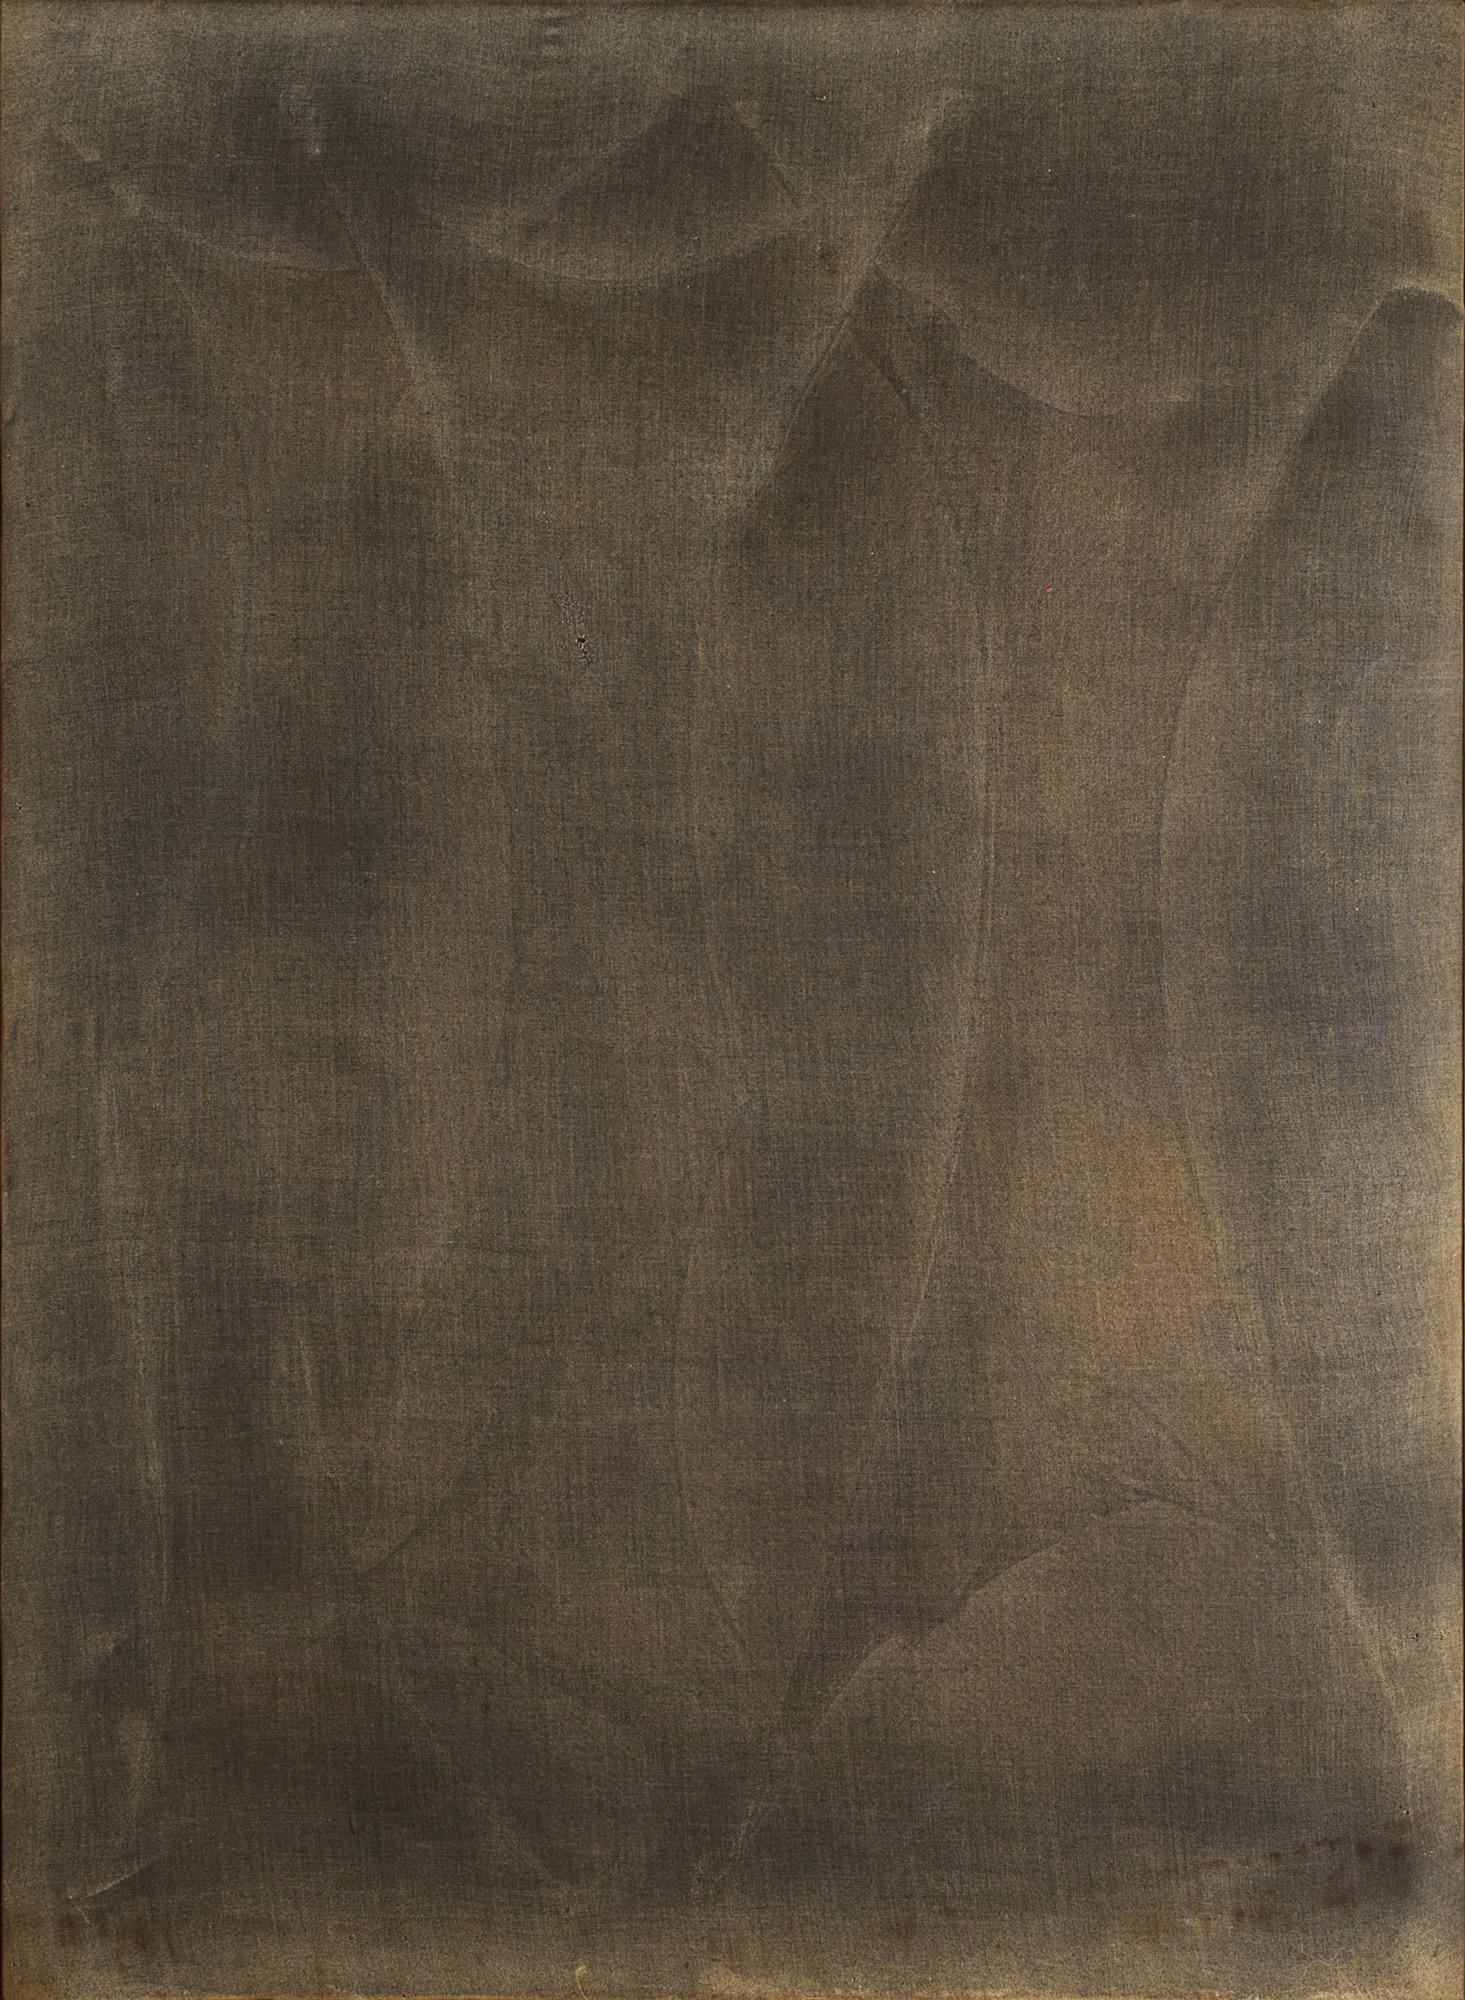 Trasparenza, 1960